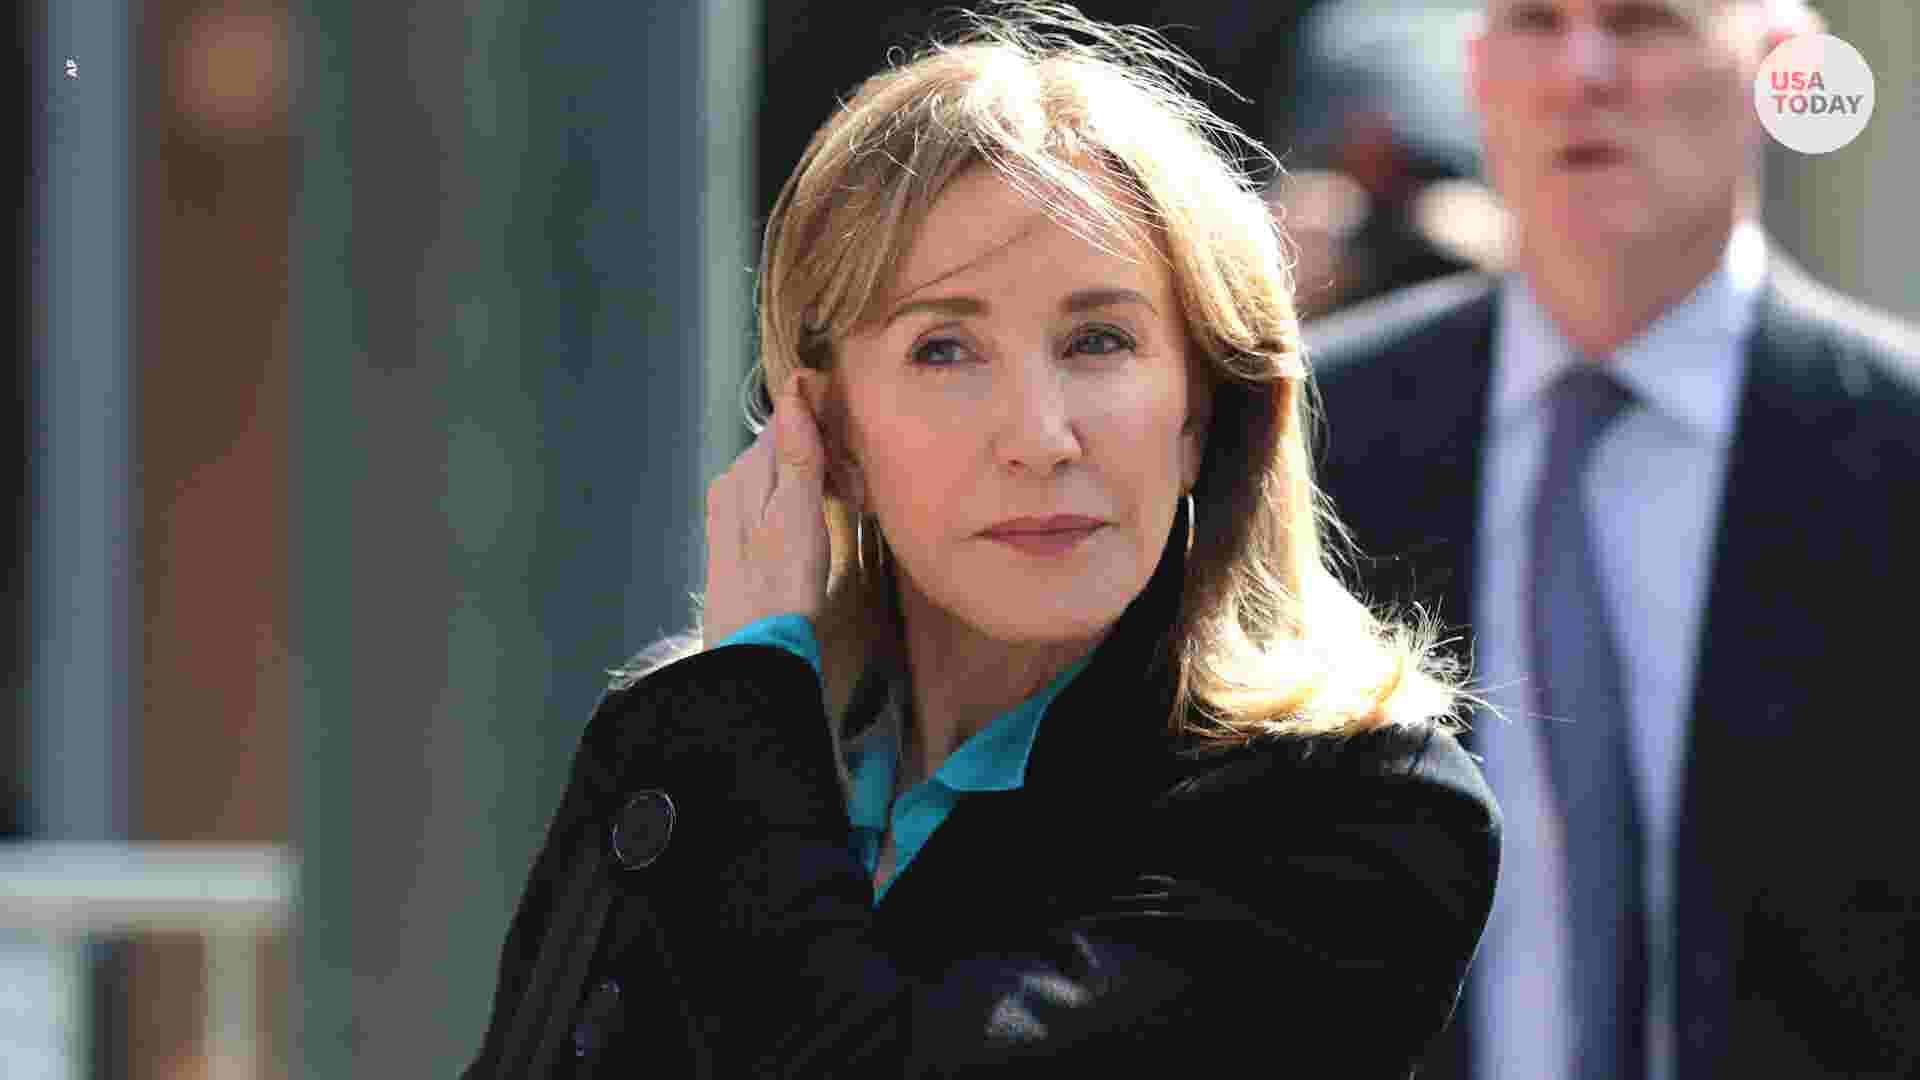 Felicity Huffman: Deep regret, shame over what I have done